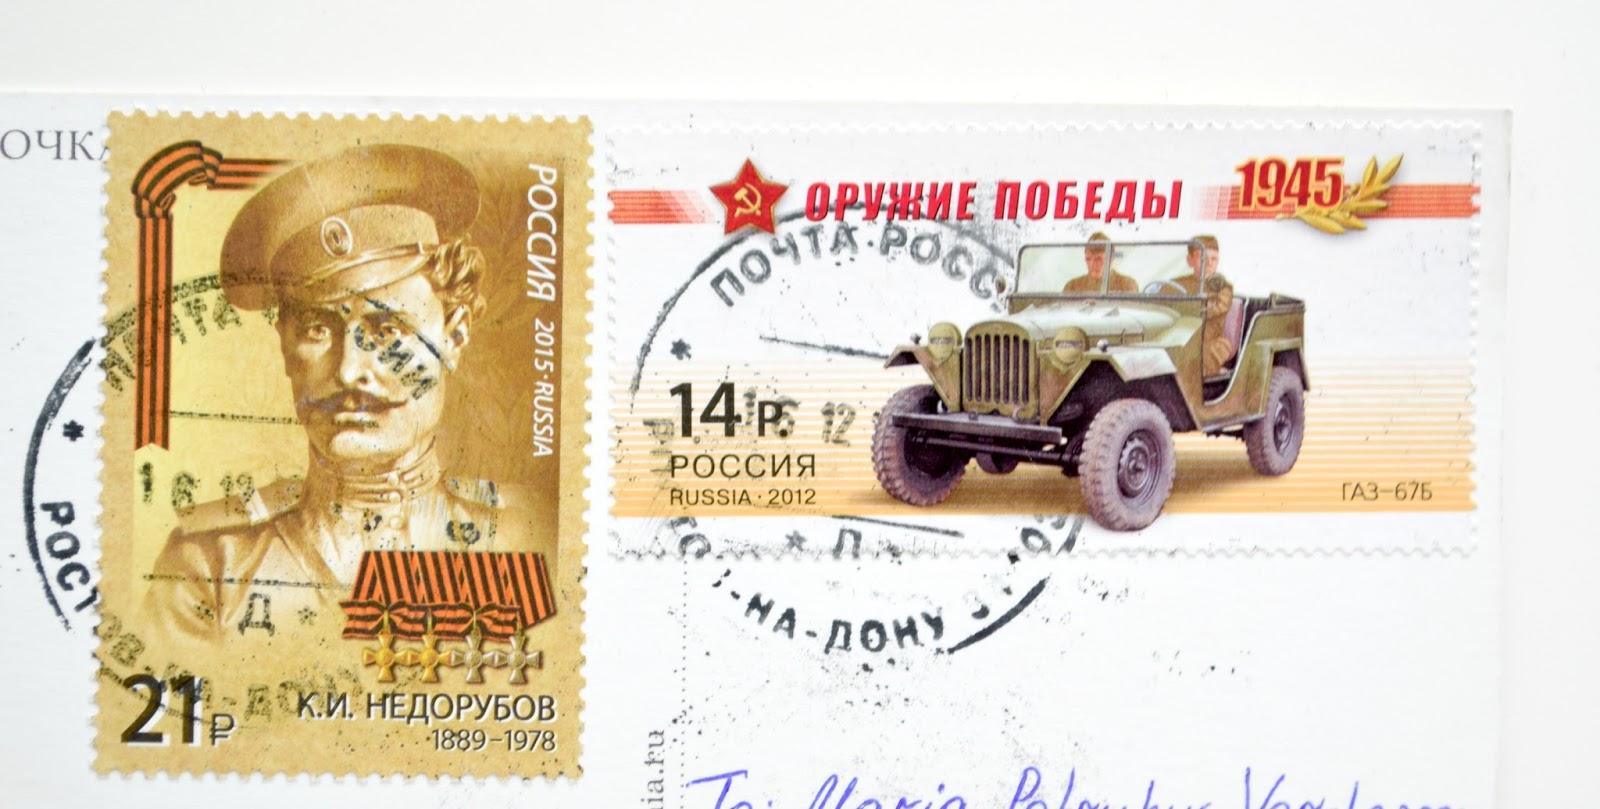 militarne znaczki z rosji